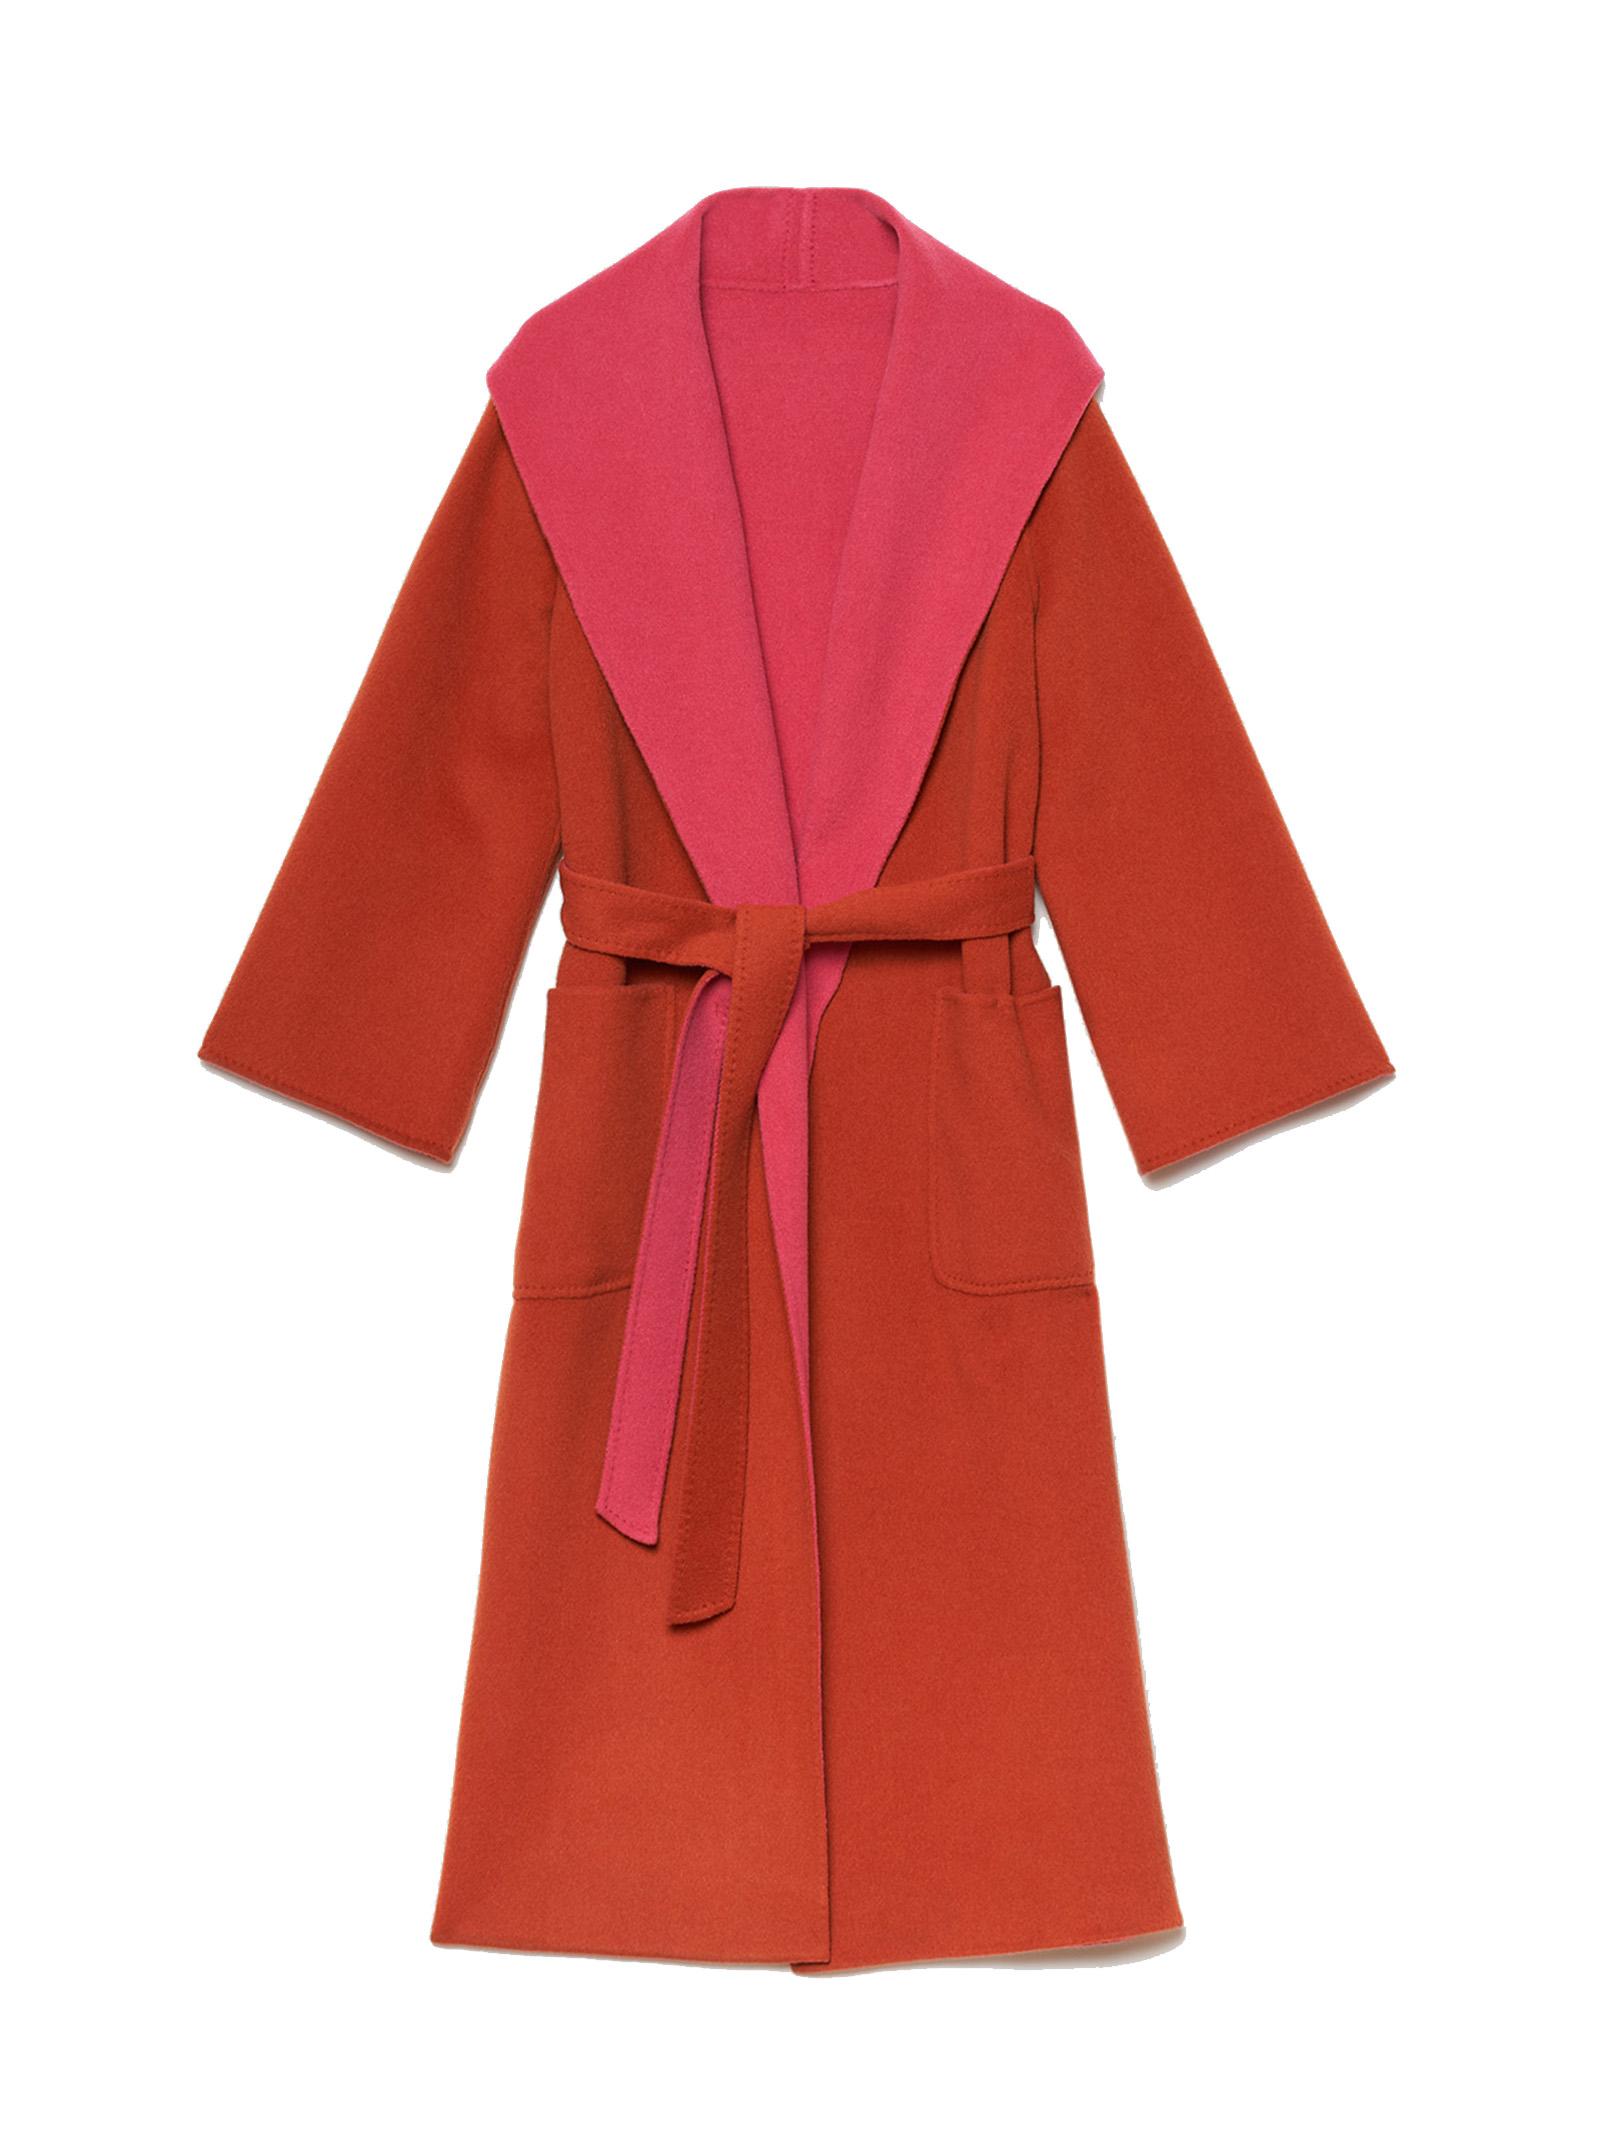 Women's Clothing Double Coat in Orange and Fuchsia Wool with Belt Maliparmi   Coats and jackets   JB53262027631B34